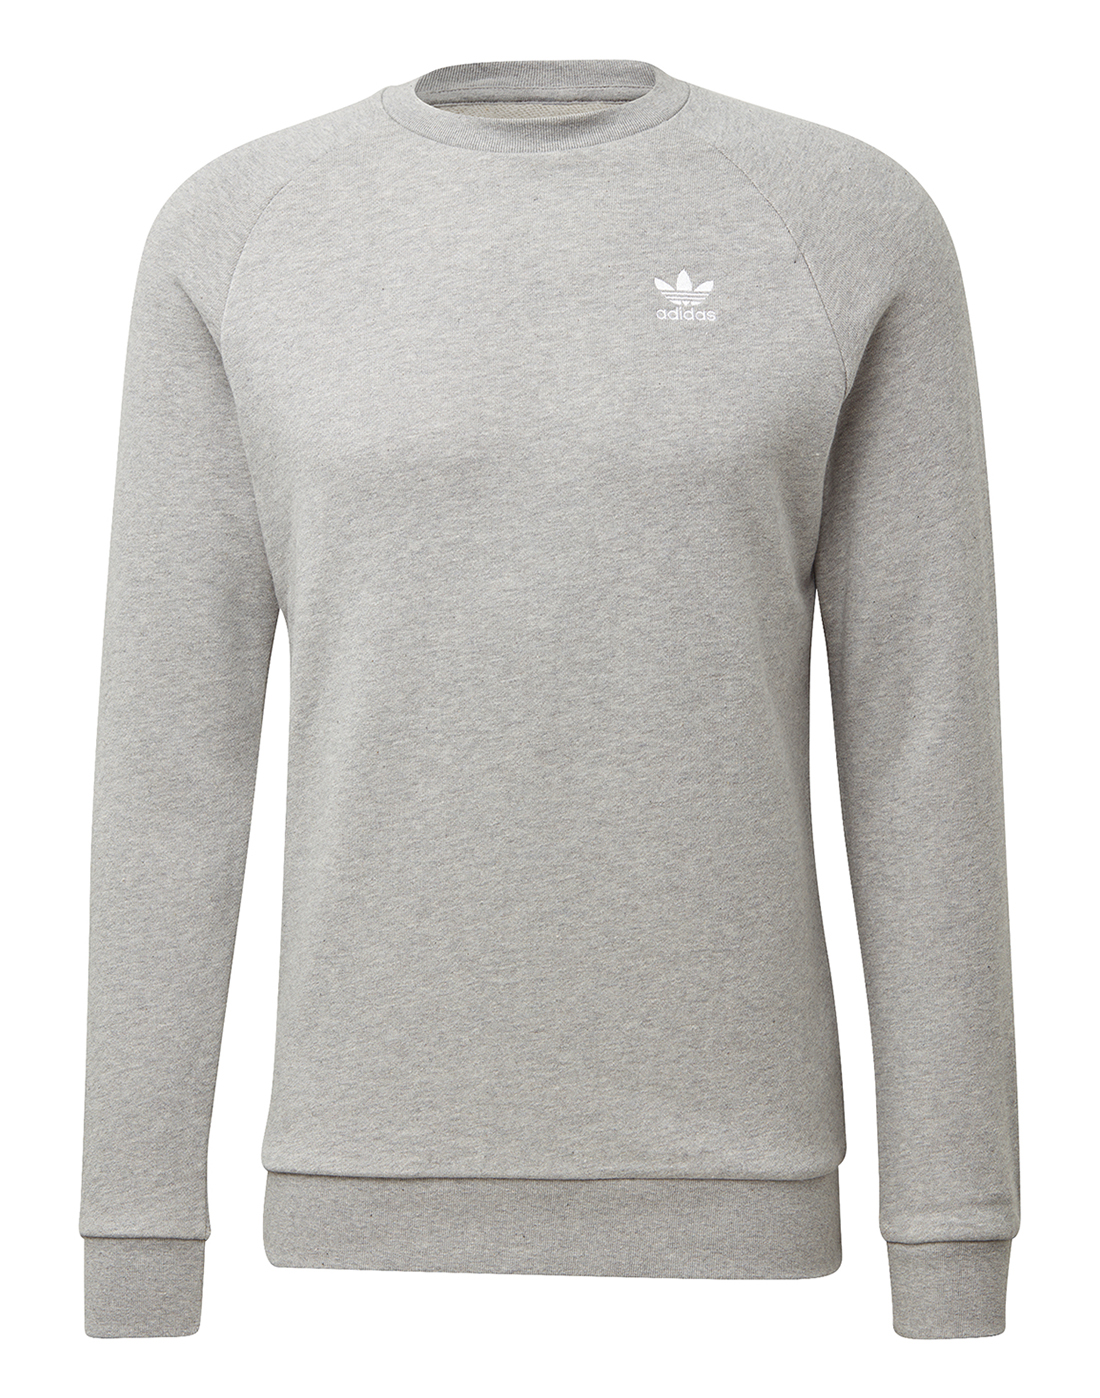 Men s Grey adidas Originals Sweatshirt  90b8cd1952